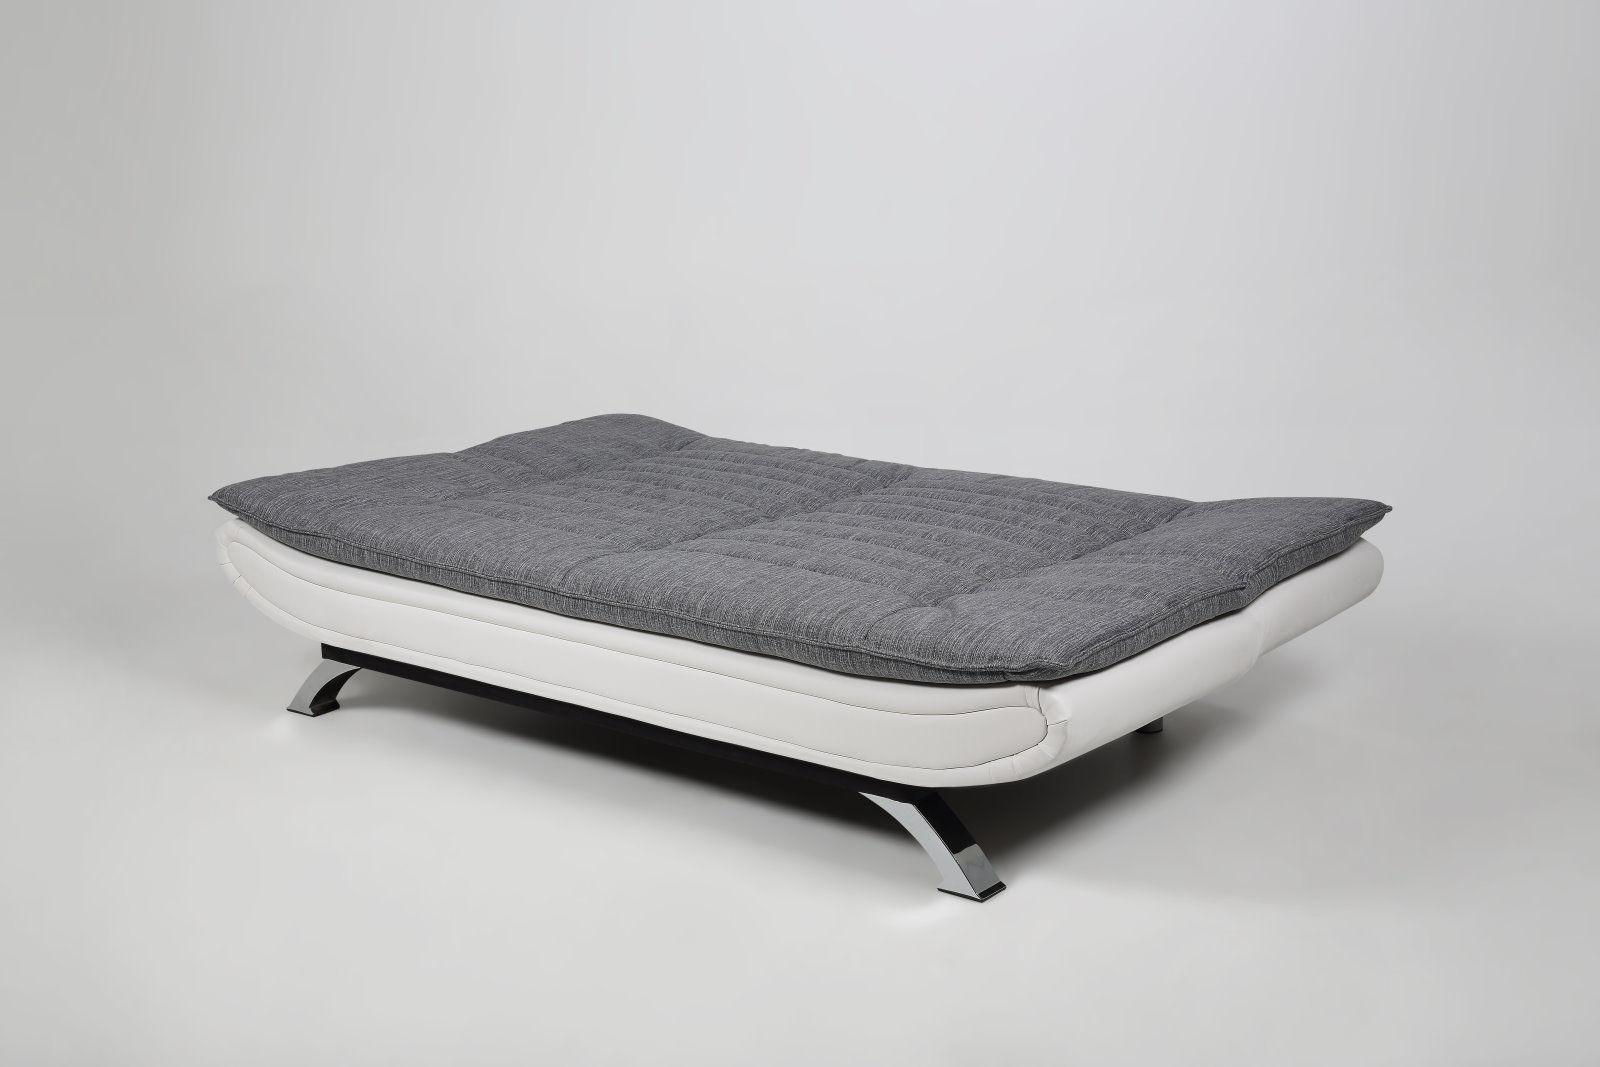 Pkline Schlafsofa Weiss Grau Schlafcouch Funktionssofa Gaste Bett Couch